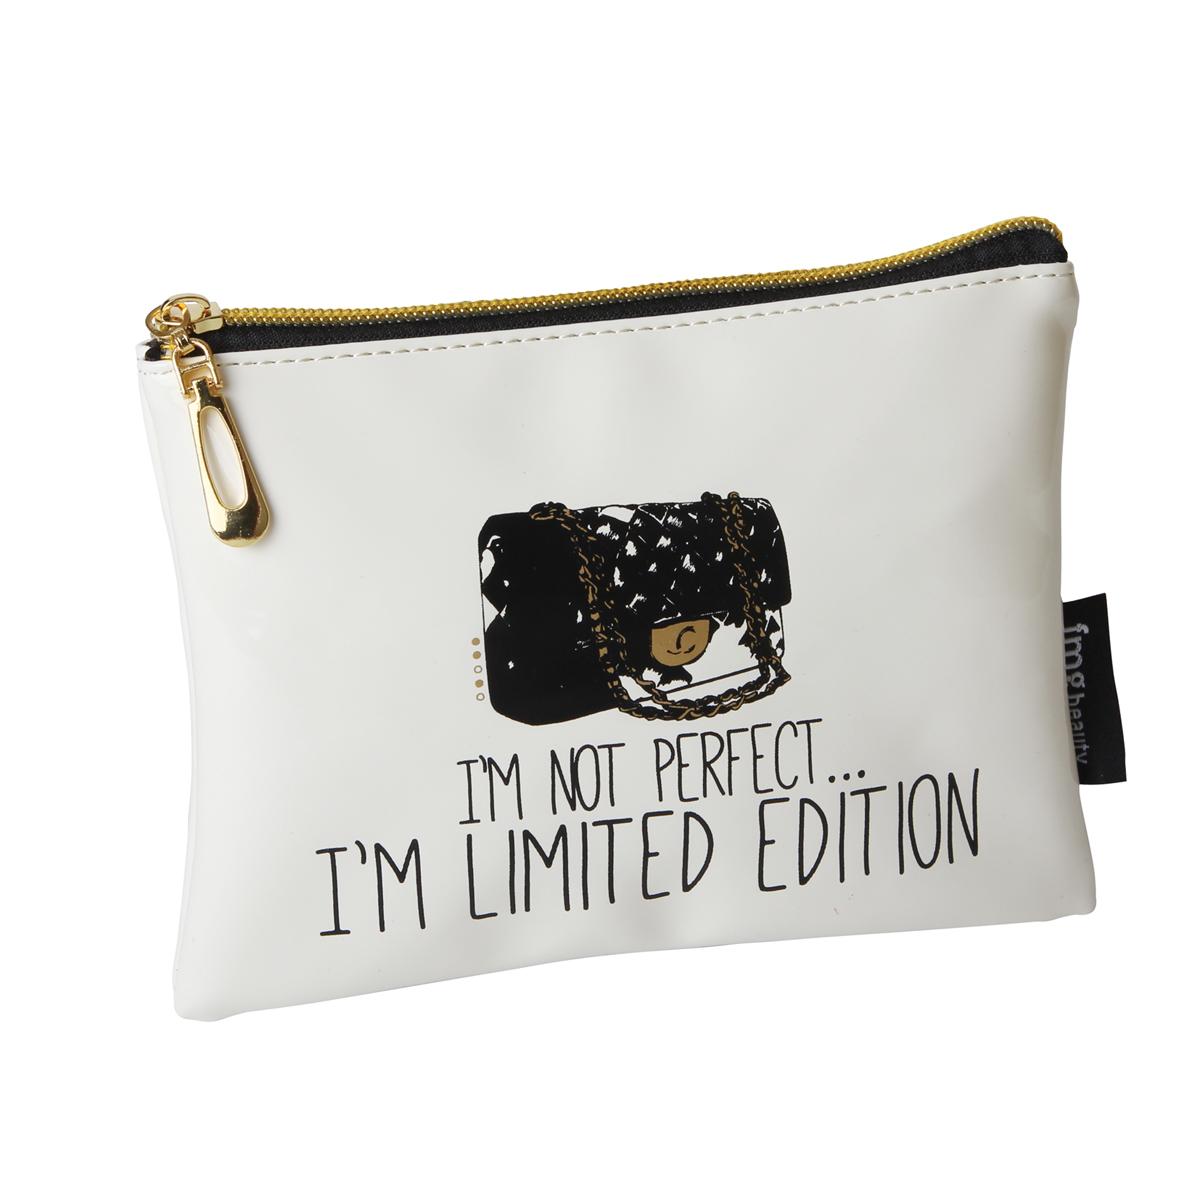 I'm Not Perfect' Makeup Bag - B2069